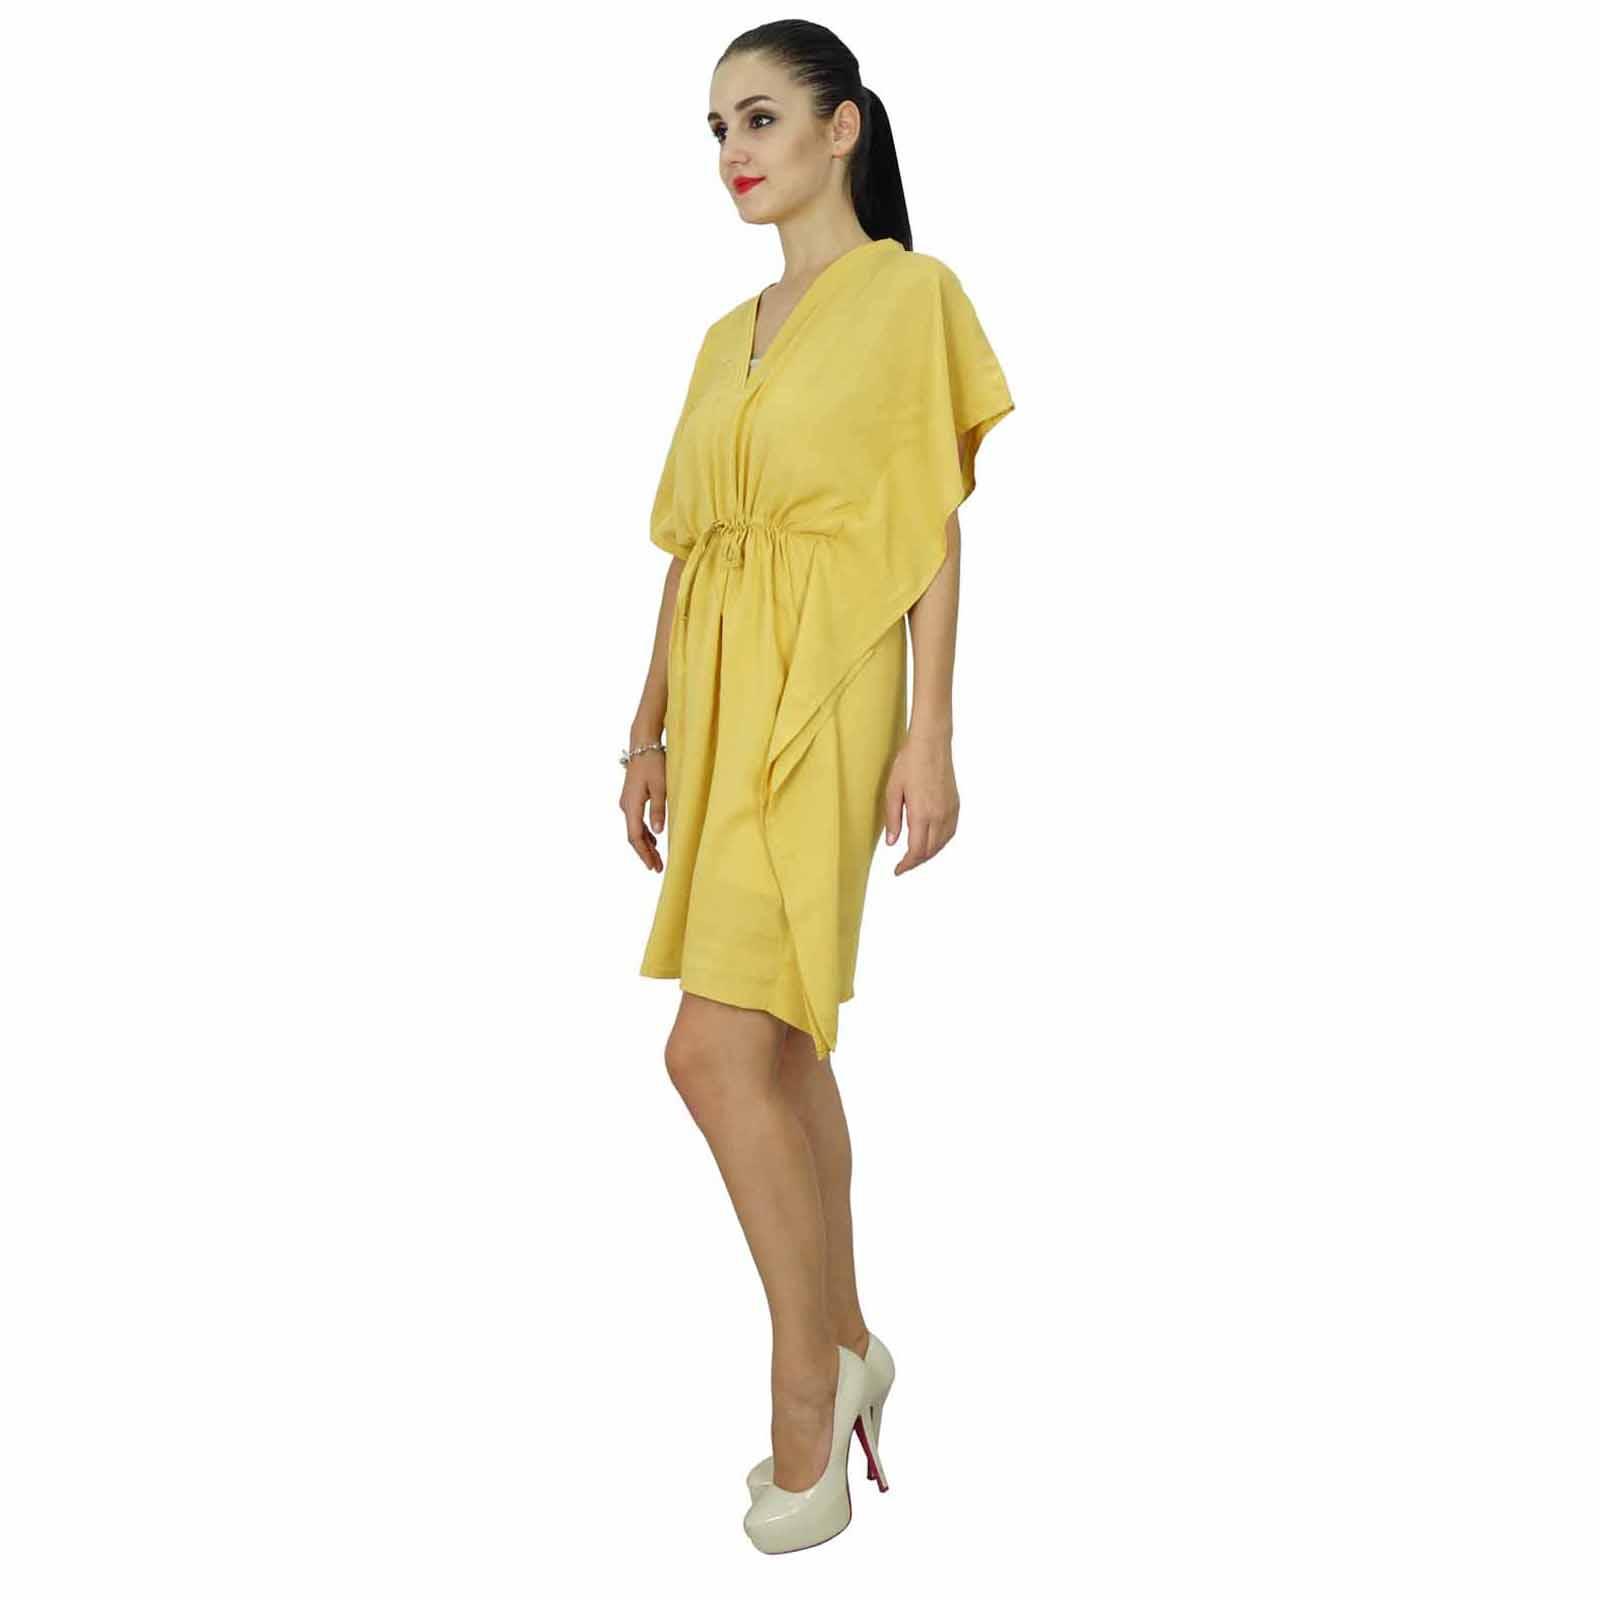 thumbnail 42 - Bimba Women Plain Kaftan Dress Beach Cover Up Cotton Solid Caftan-58z